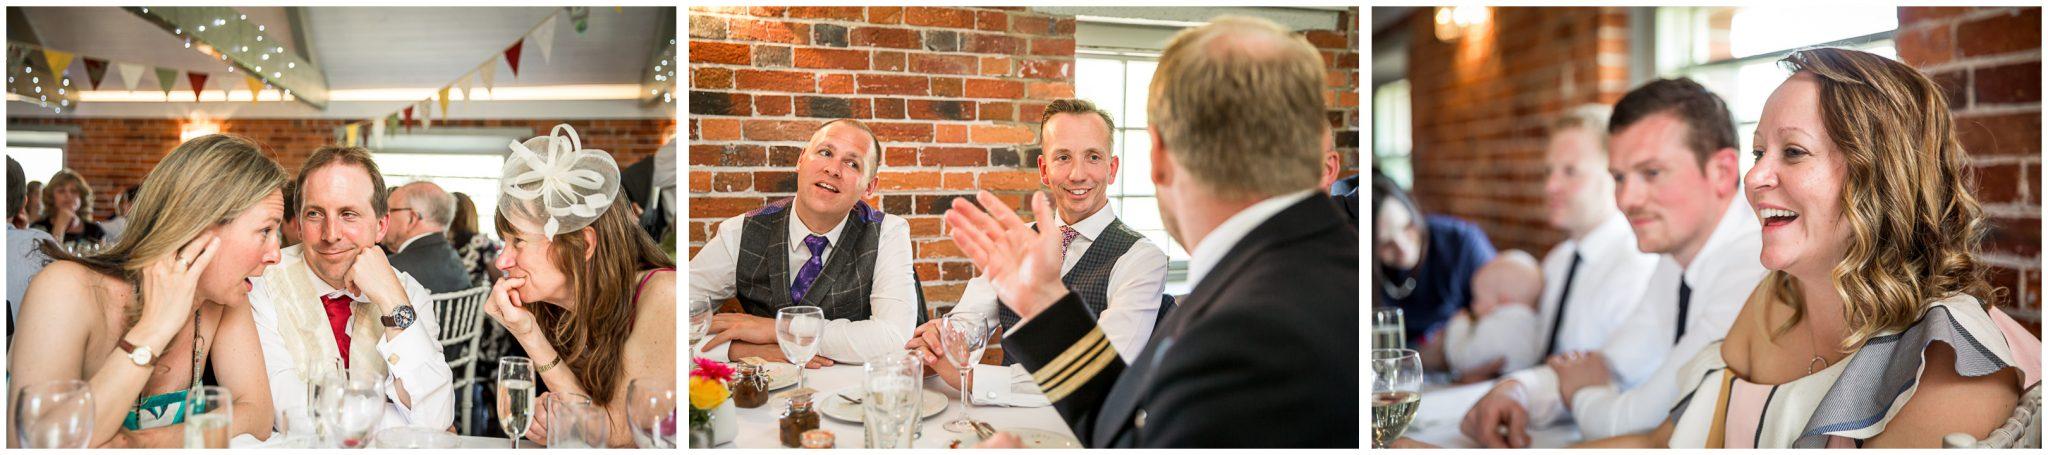 Sopley wedding photographer guests during wedding breakfast